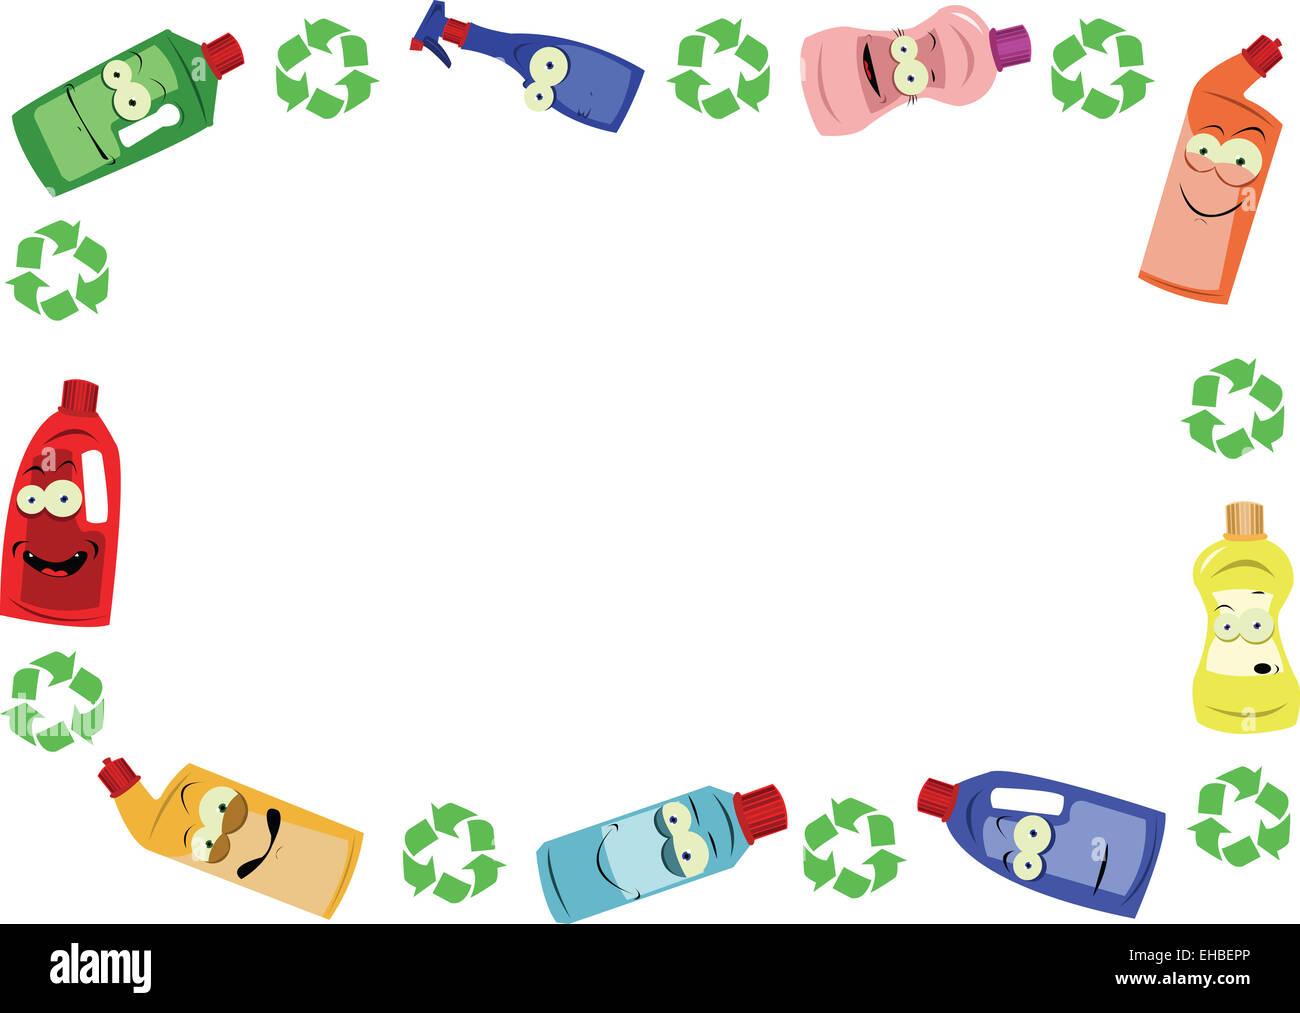 Funny Recycling Frame Stock Photo: 79543710 - Alamy